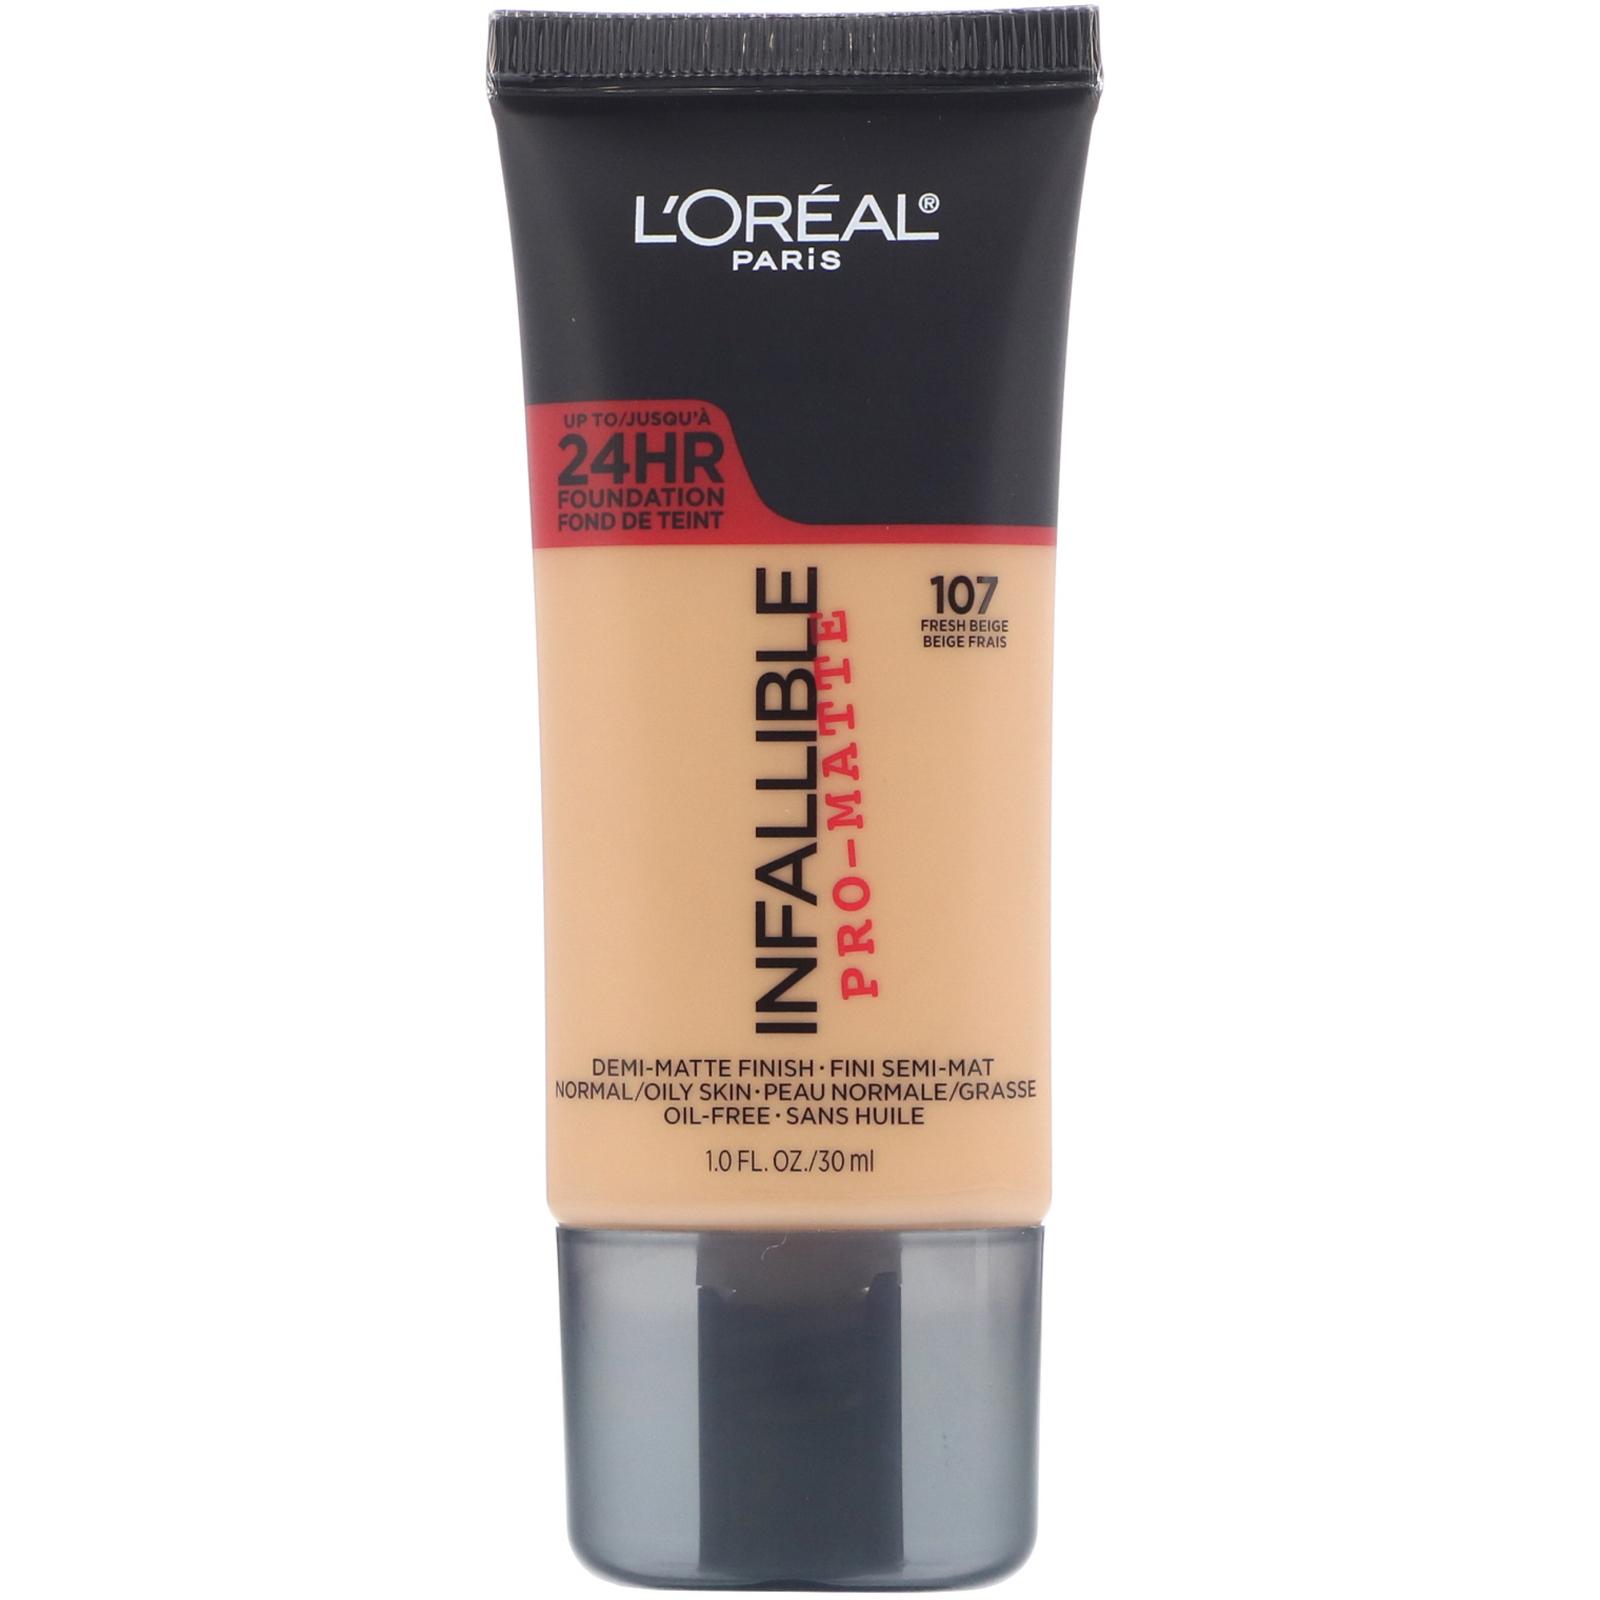 L Oreal Infallible Pro Matte Foundation 107 Fresh Beige 1 Fl Oz 30 Ml Iherb